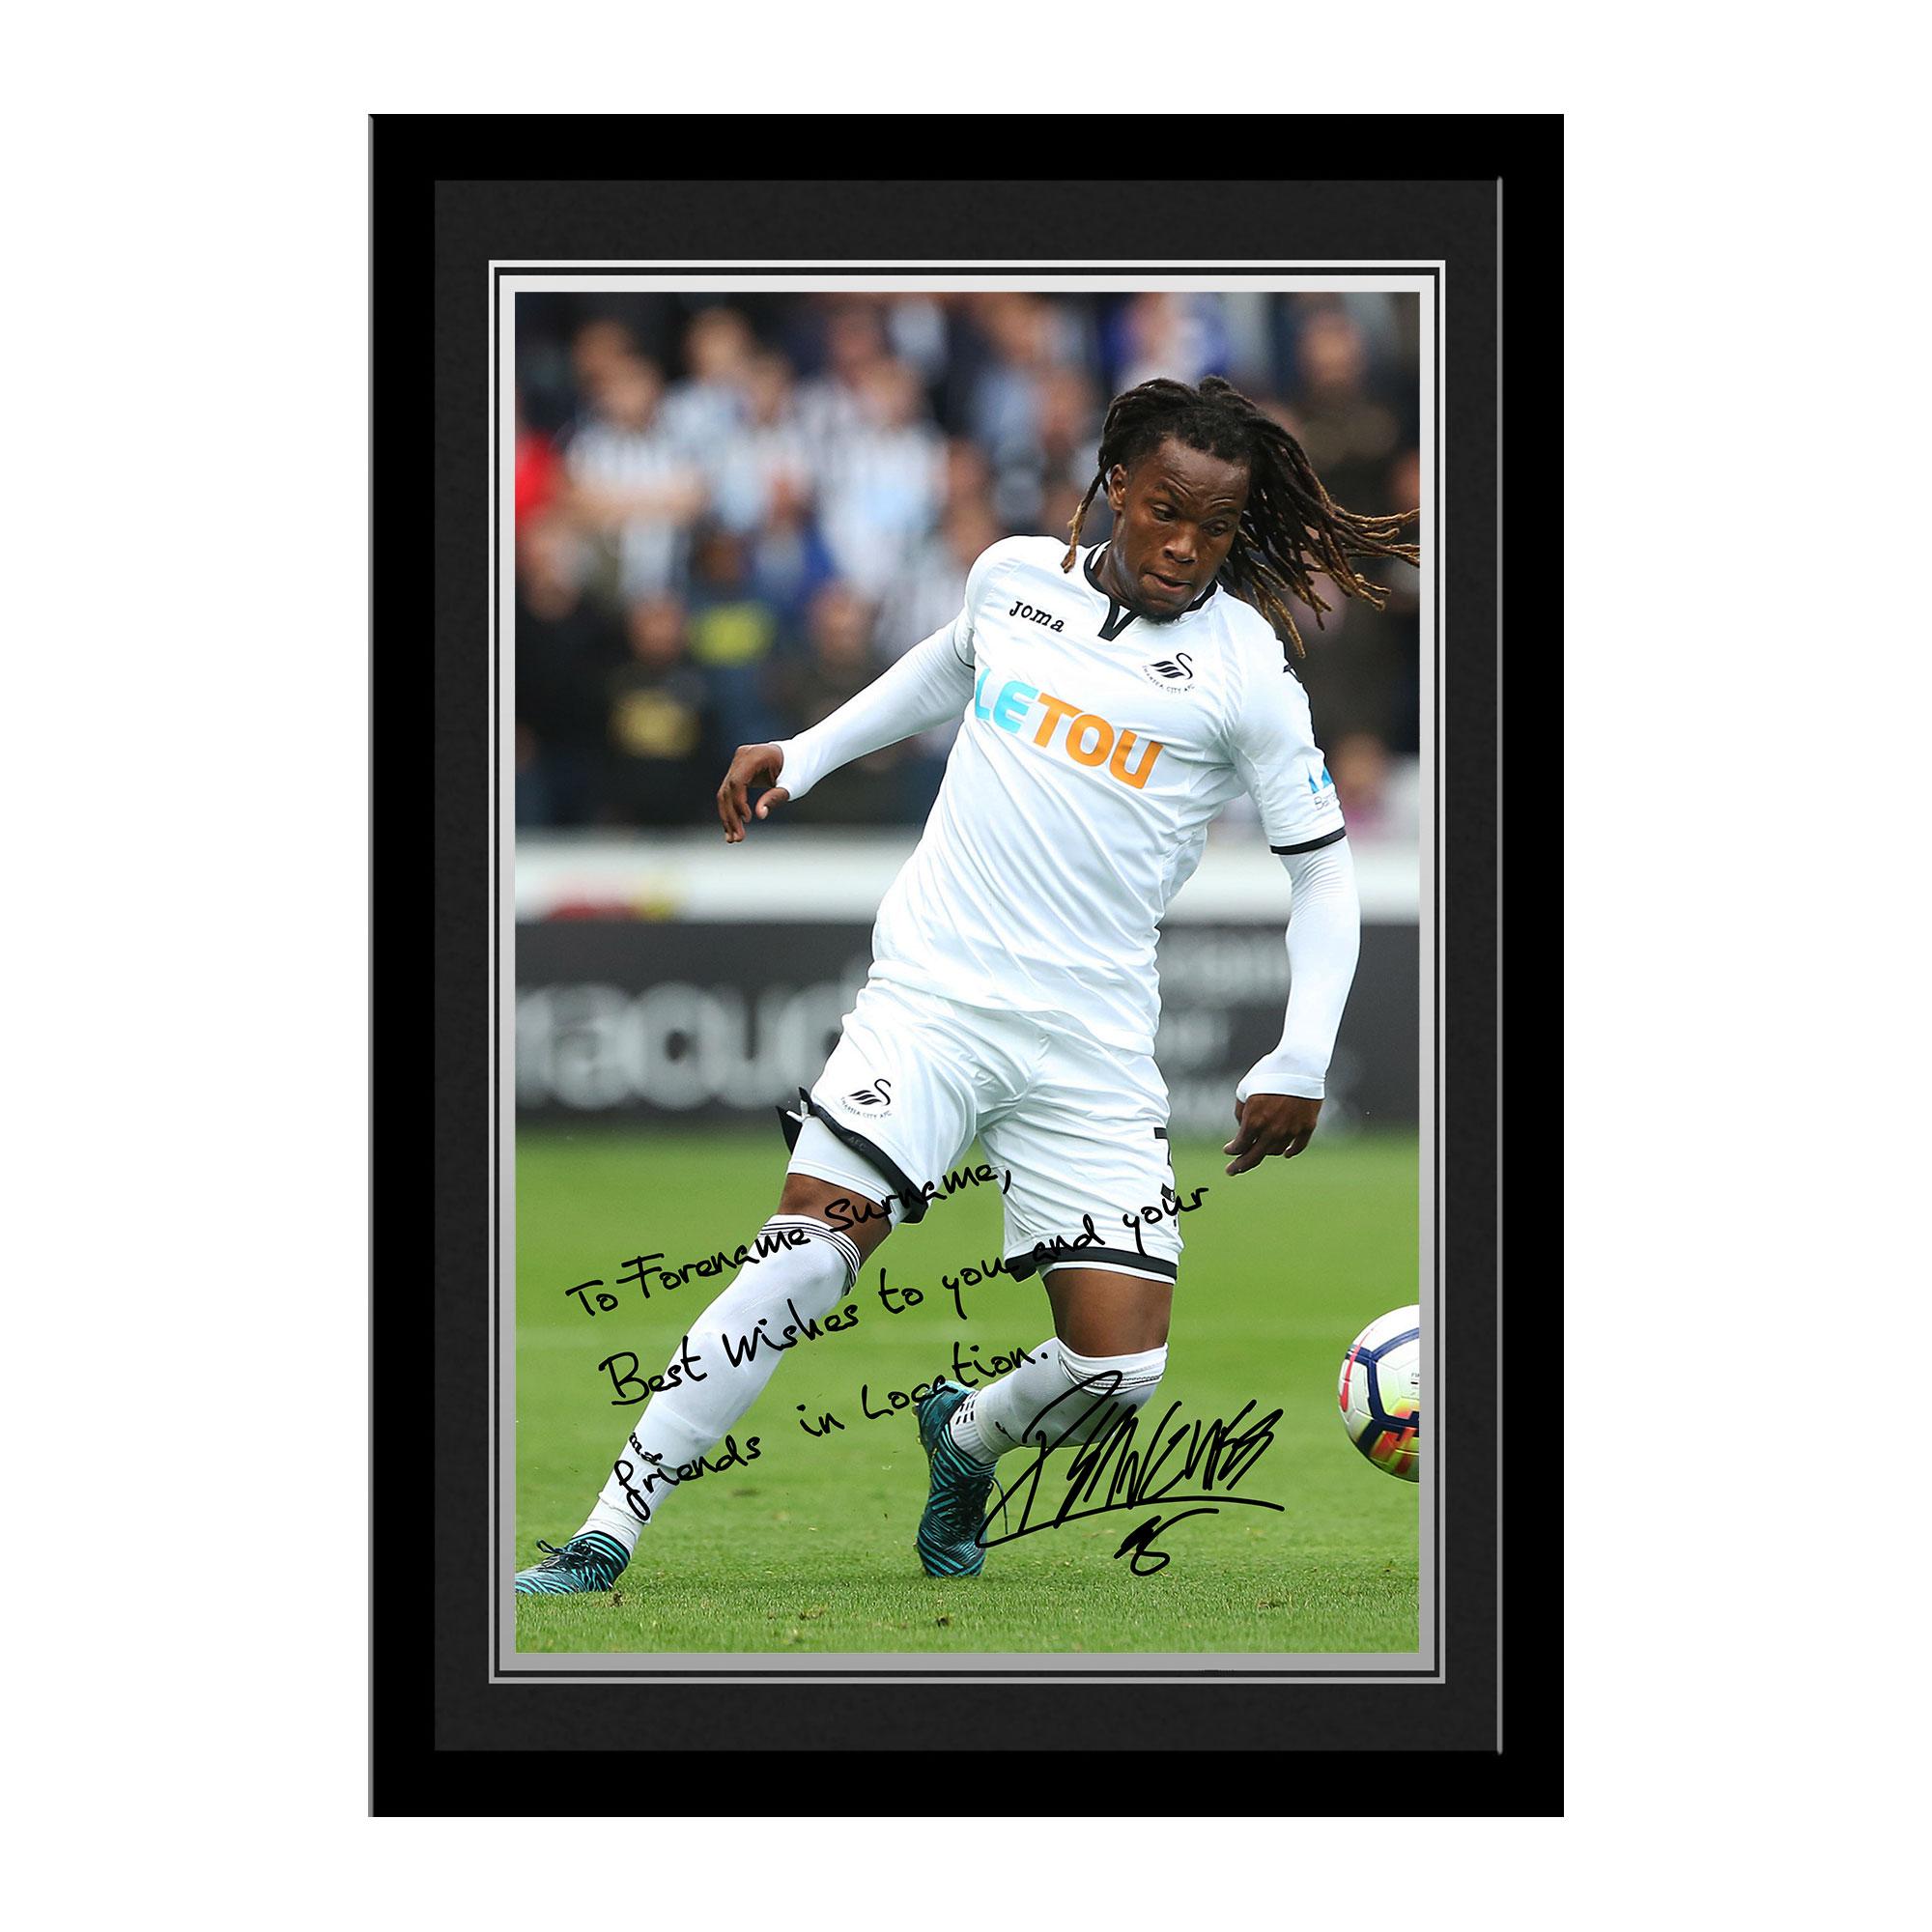 Swansea City AFC Sanches Autograph Photo Framed